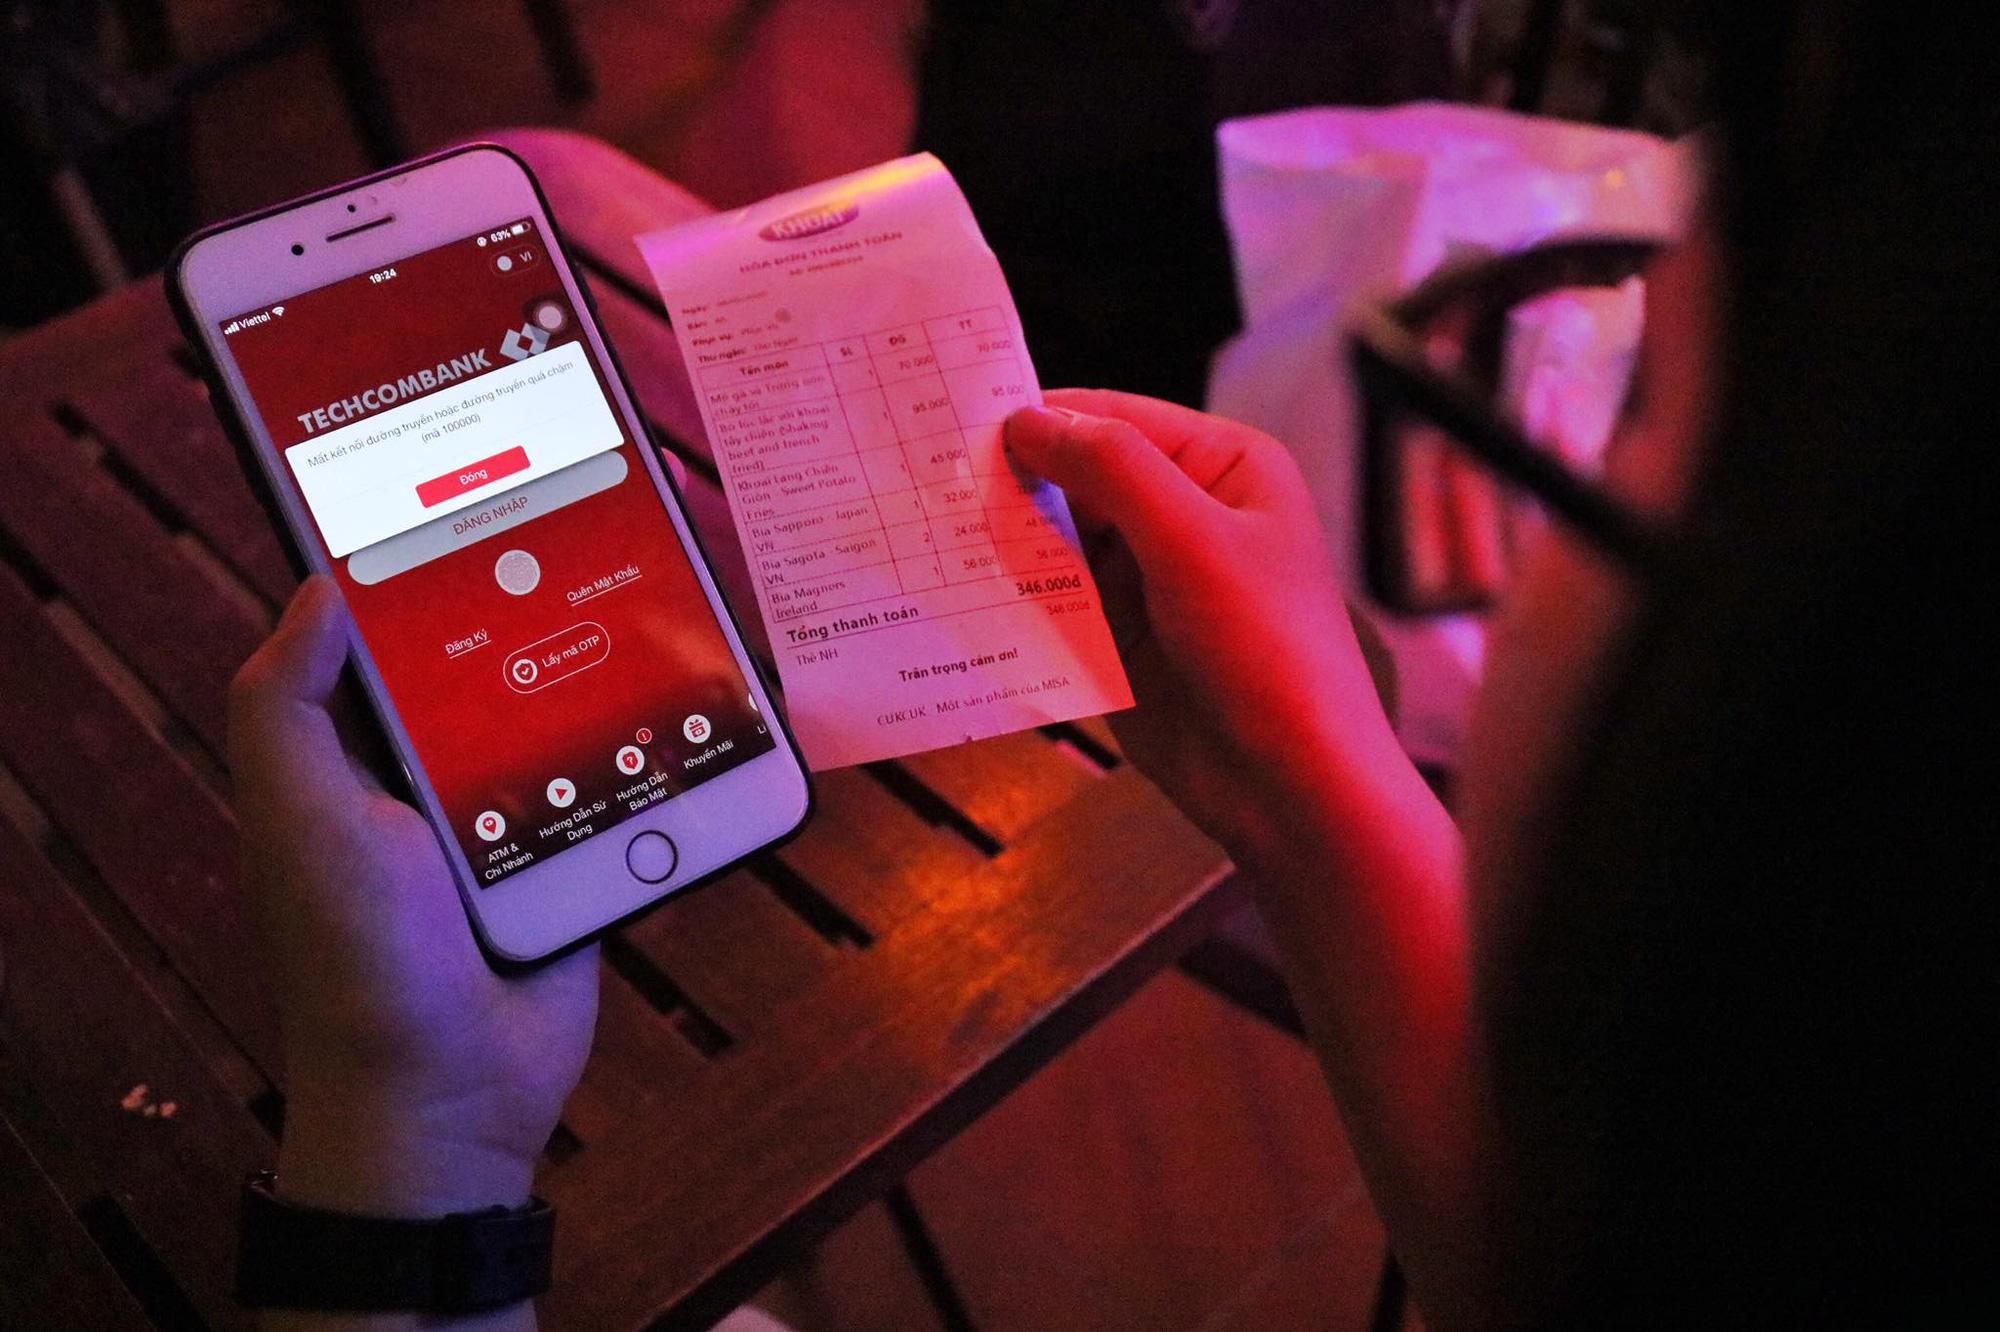 Vietnam's Techcombank blames upgrade for system failure